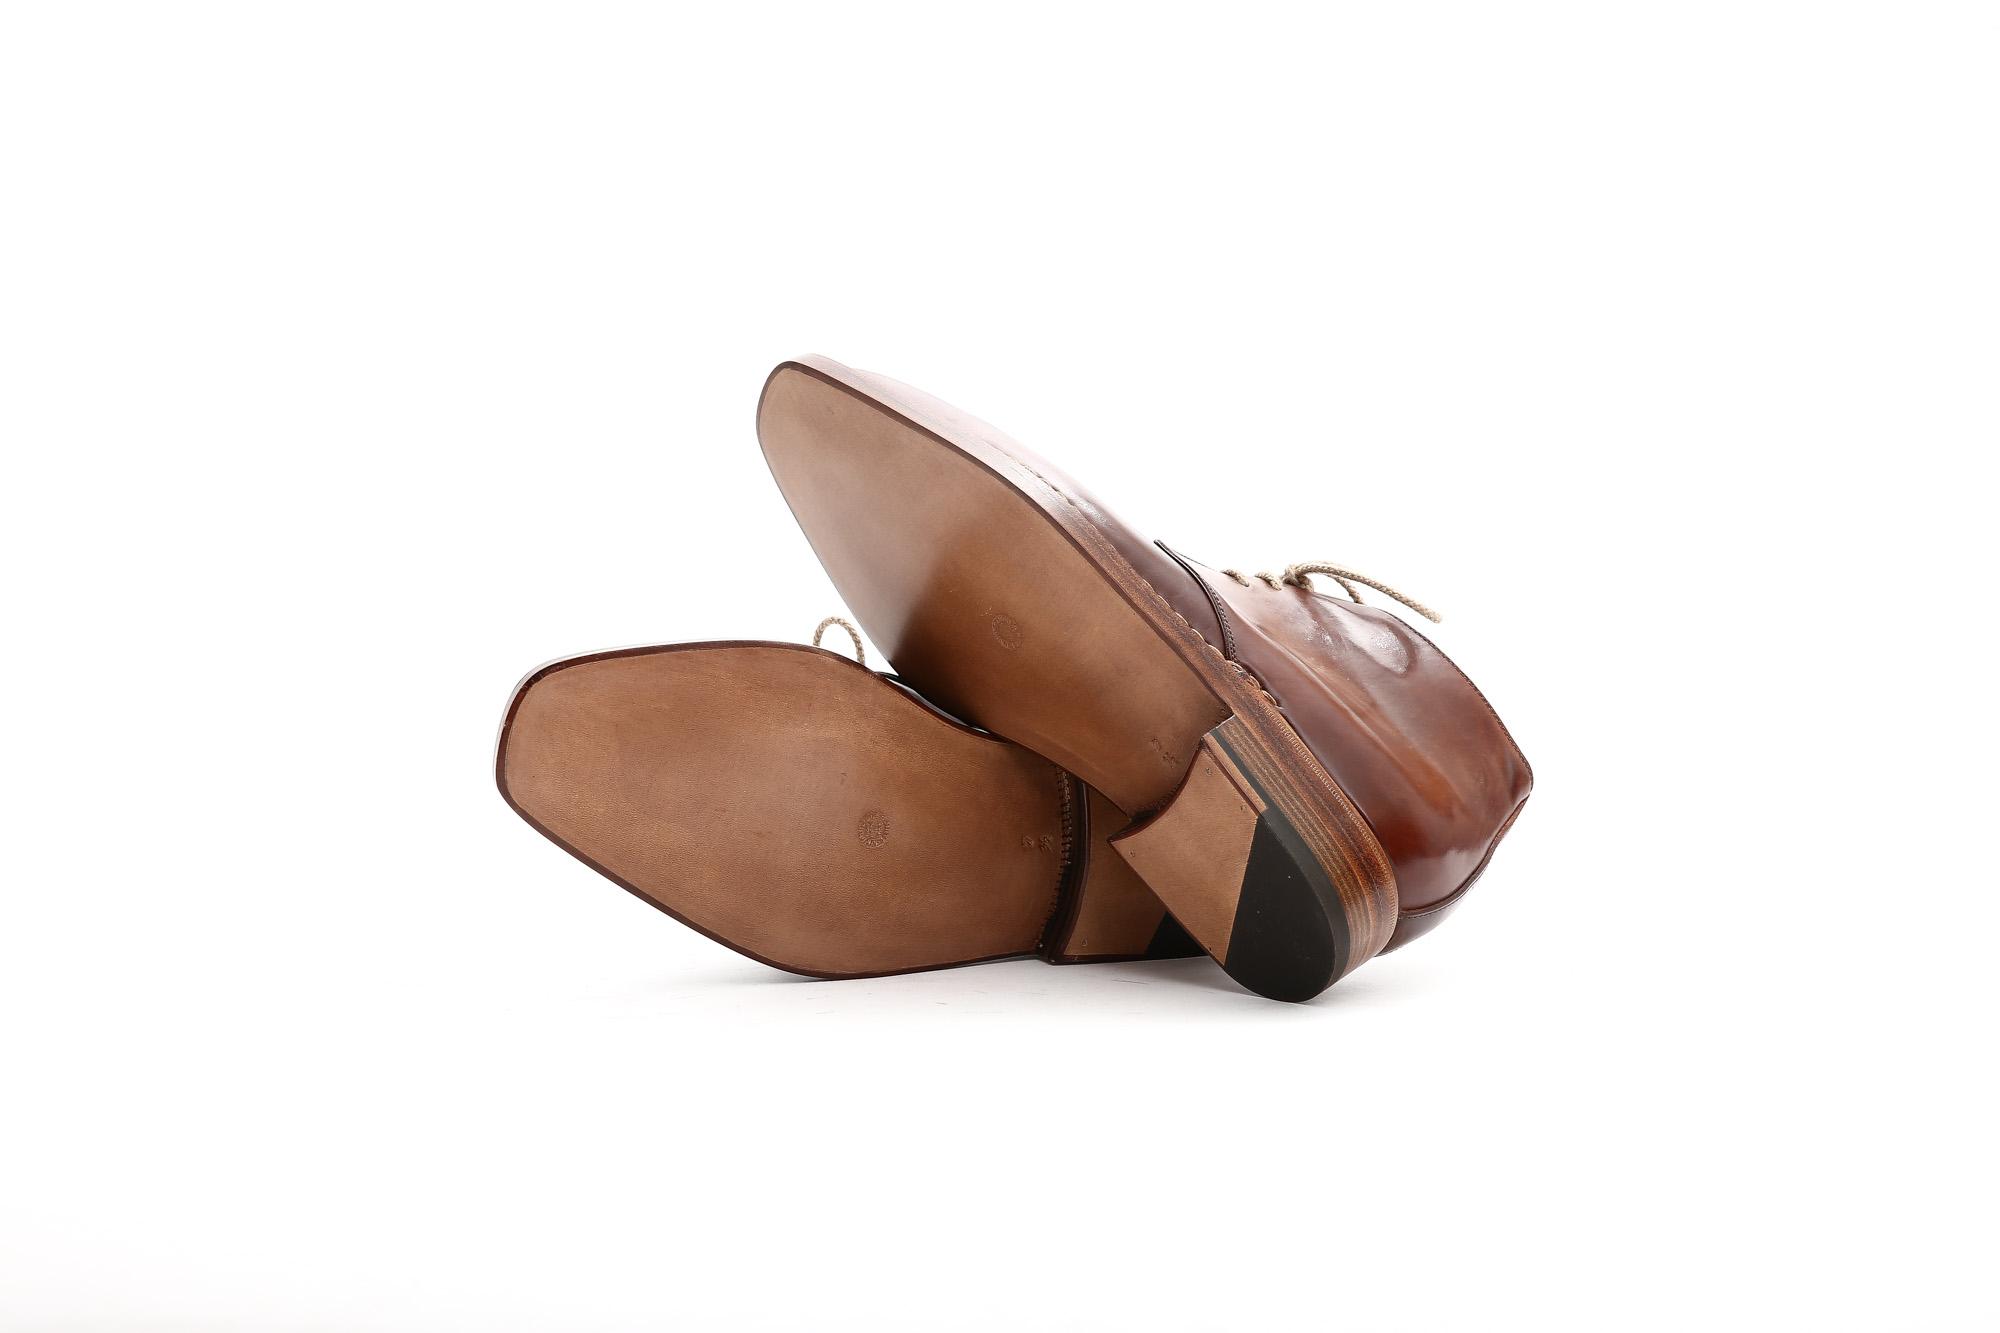 【ENZO BONAFE  / エンツォボナフェ】 ART.3722 Chukka boots チャッカブーツ Horween Shell Cordovan Leather ホーウィン社 シェルコードバンレザー 【ノルベジェーゼ製法】 チャッカブーツ コードバンブーツ 【No.4】  made in italy (イタリア製) 2017 秋冬新作  愛知 名古屋 ZODIAC ゾディアック エンツォボナフェ コードバン チャッカ enzobonafe コードヴァン